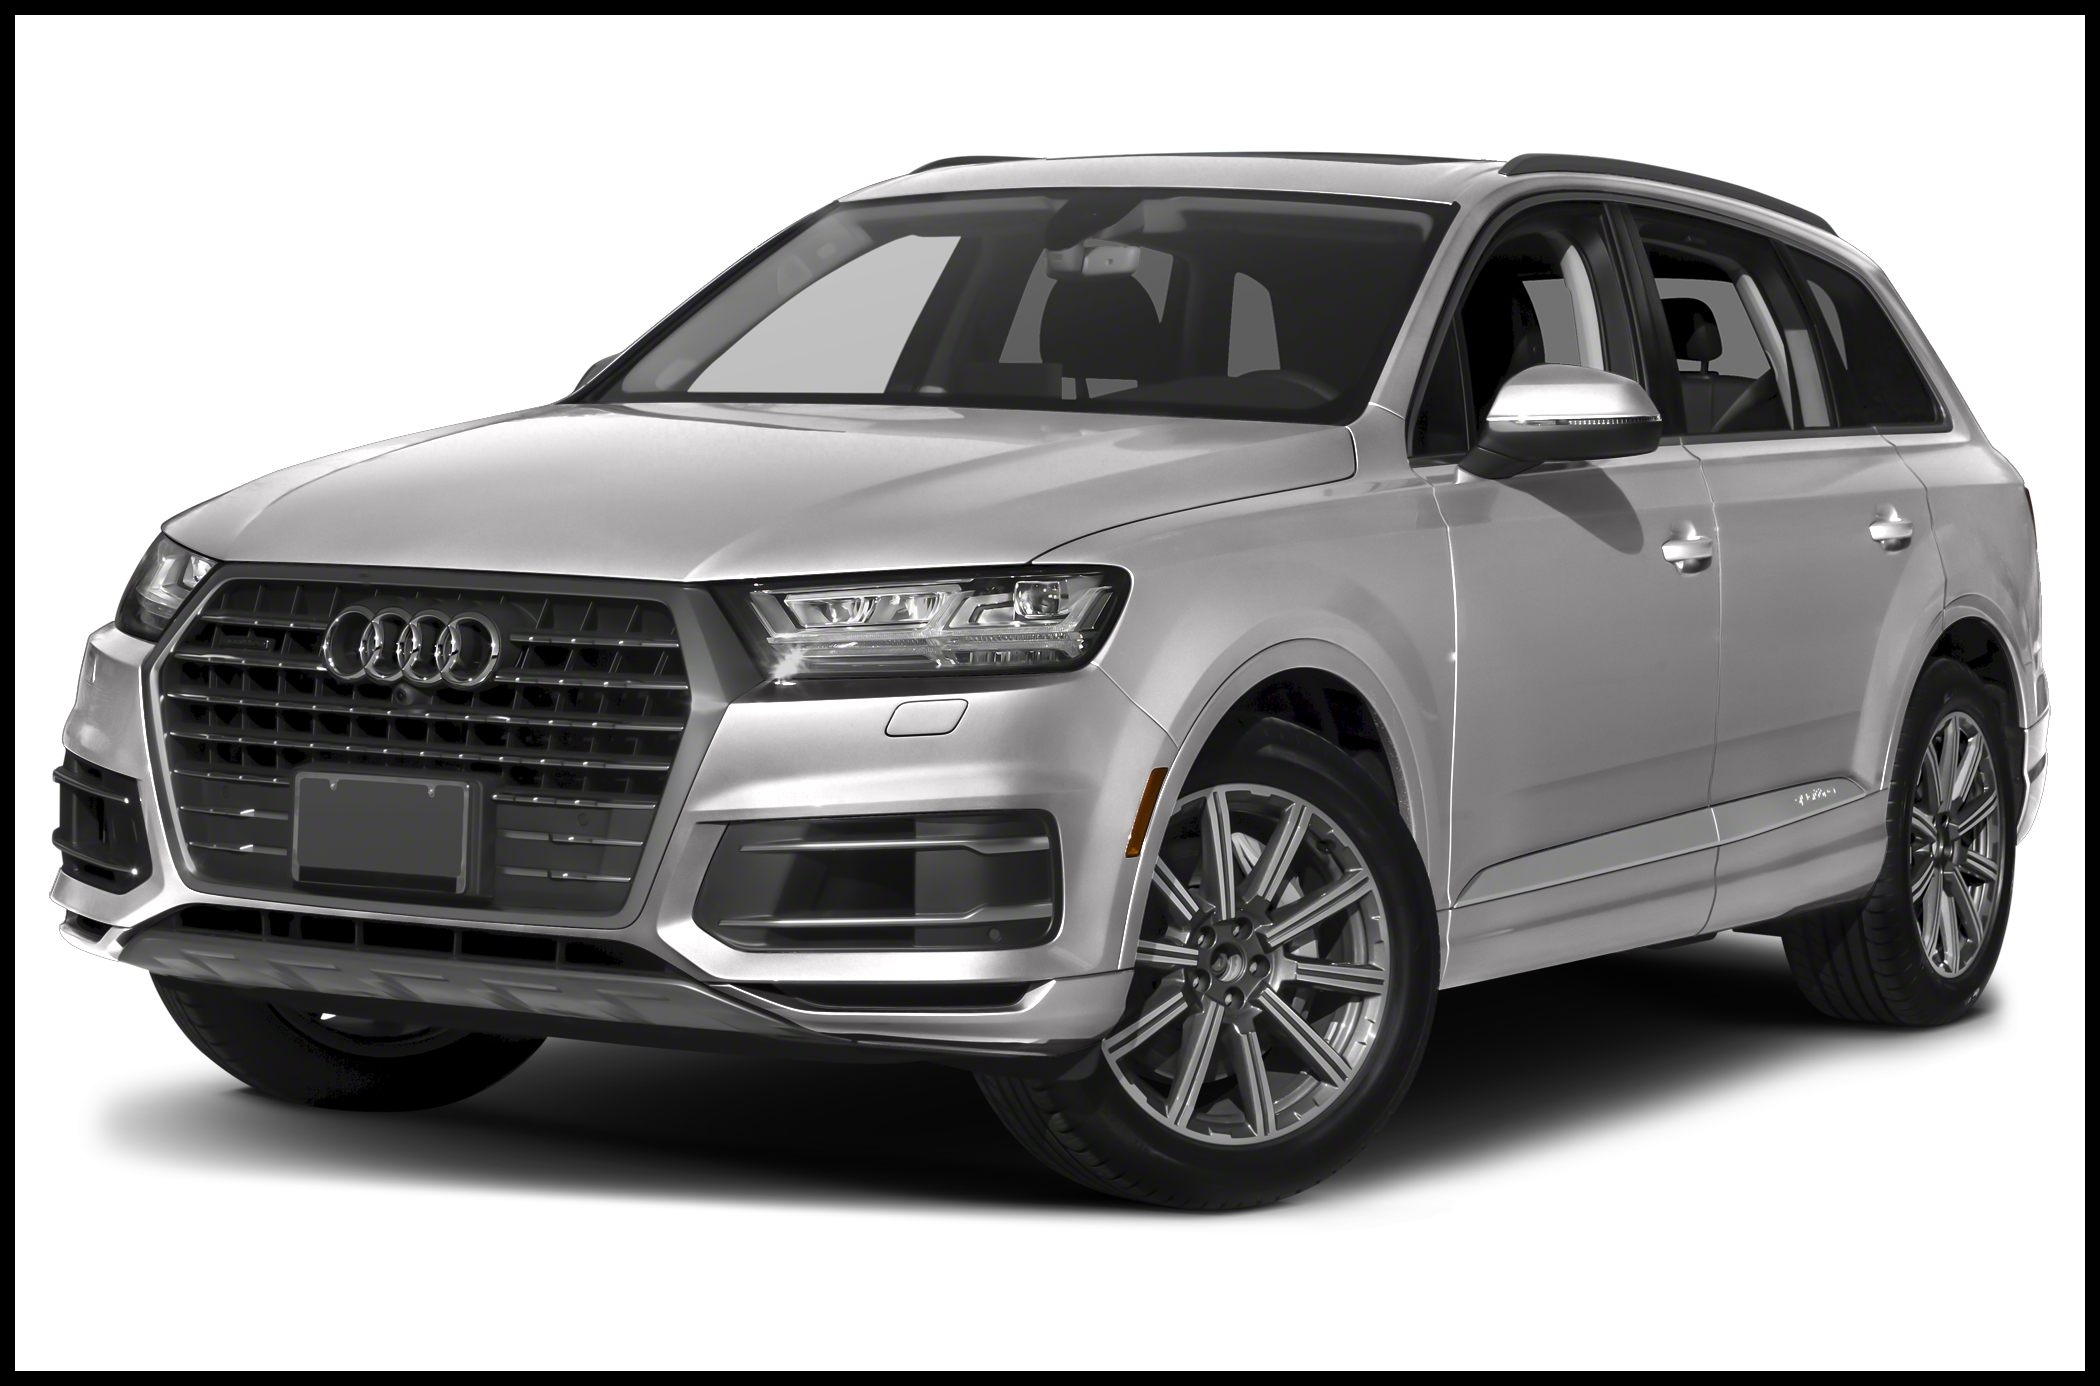 2018 Audi Q7 3 0T Premium 4dr All wheel Drive quattro Sport Utility Safety Features